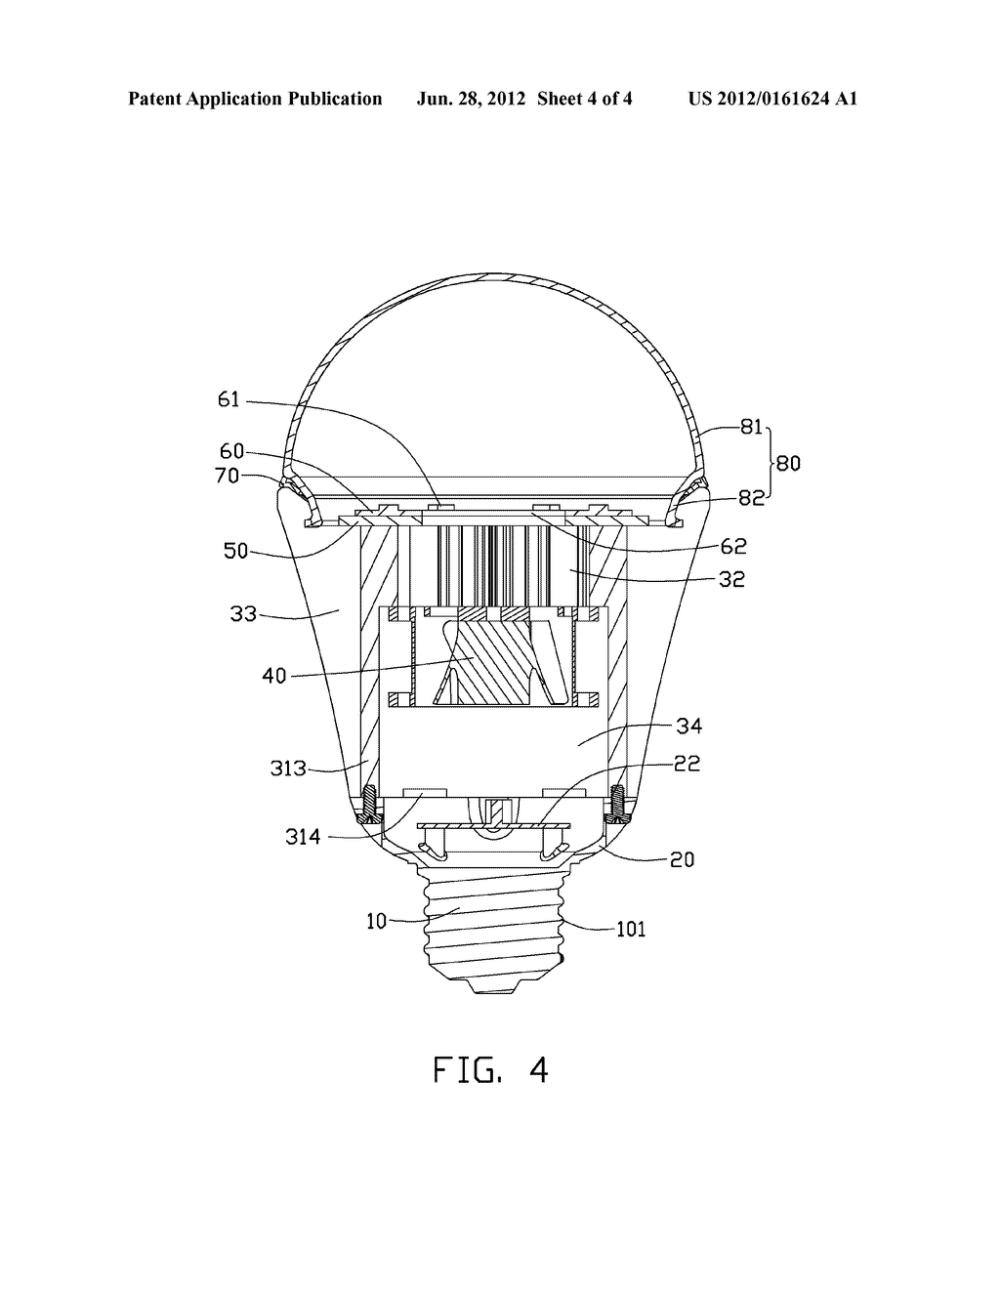 medium resolution of led bulb diagram wiring diagram schematics ryobi led light parts diagram led bulb diagram schematic wiring